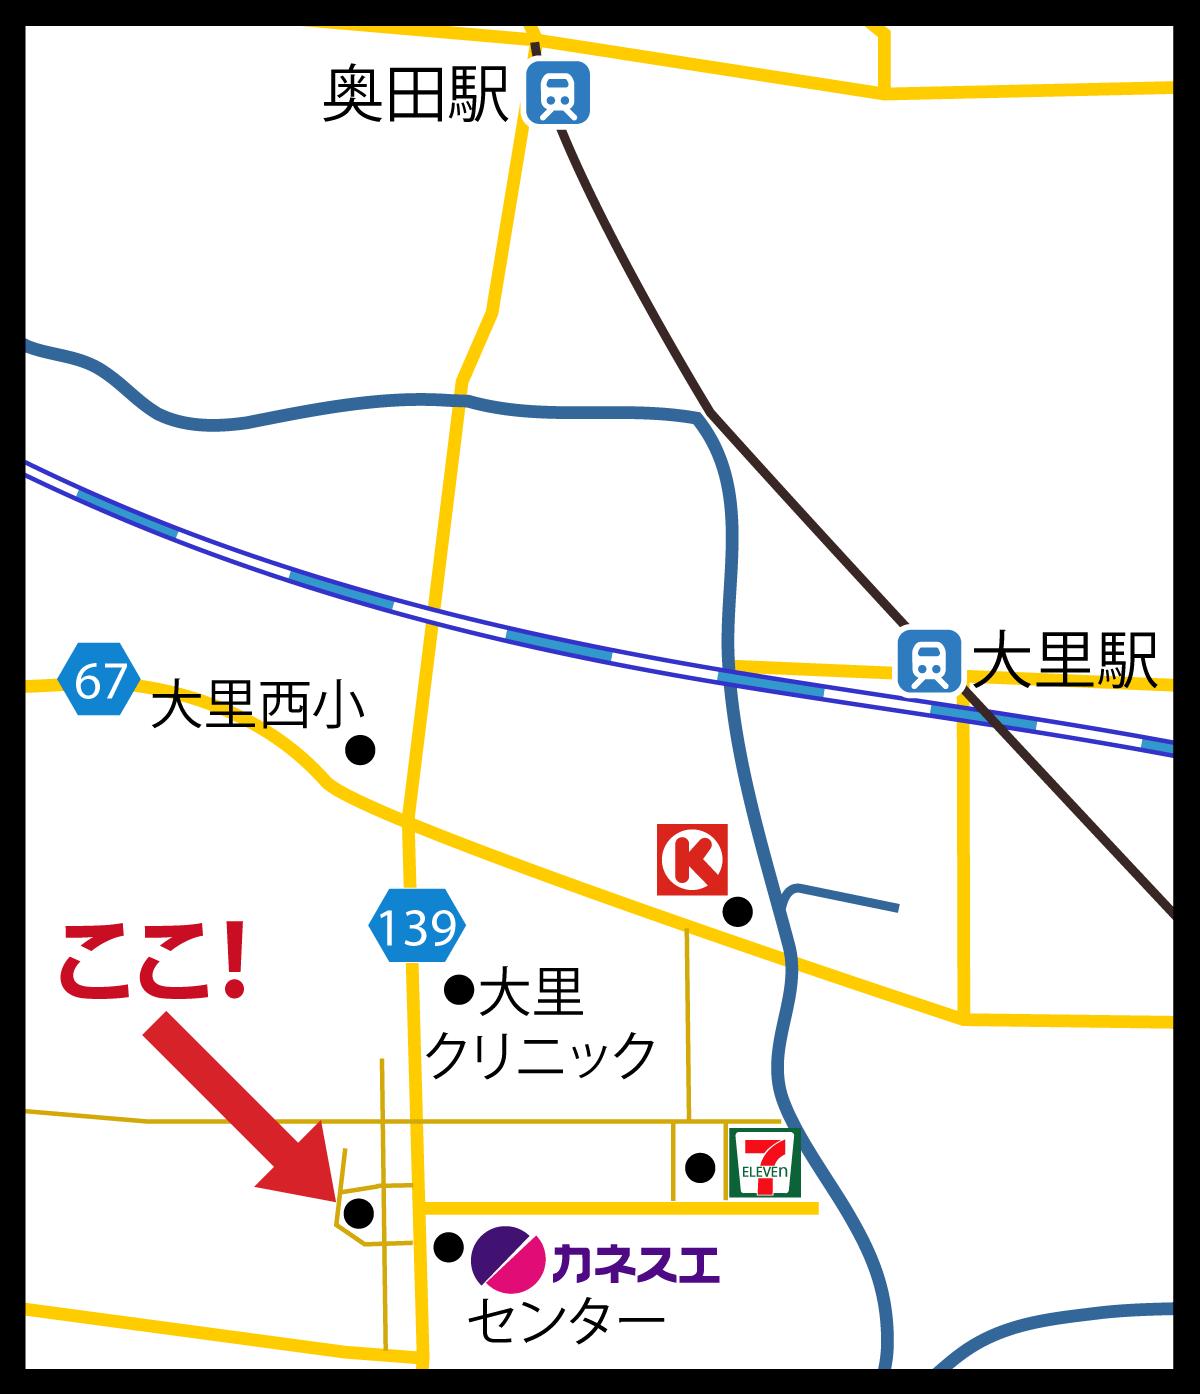 handheld version of map